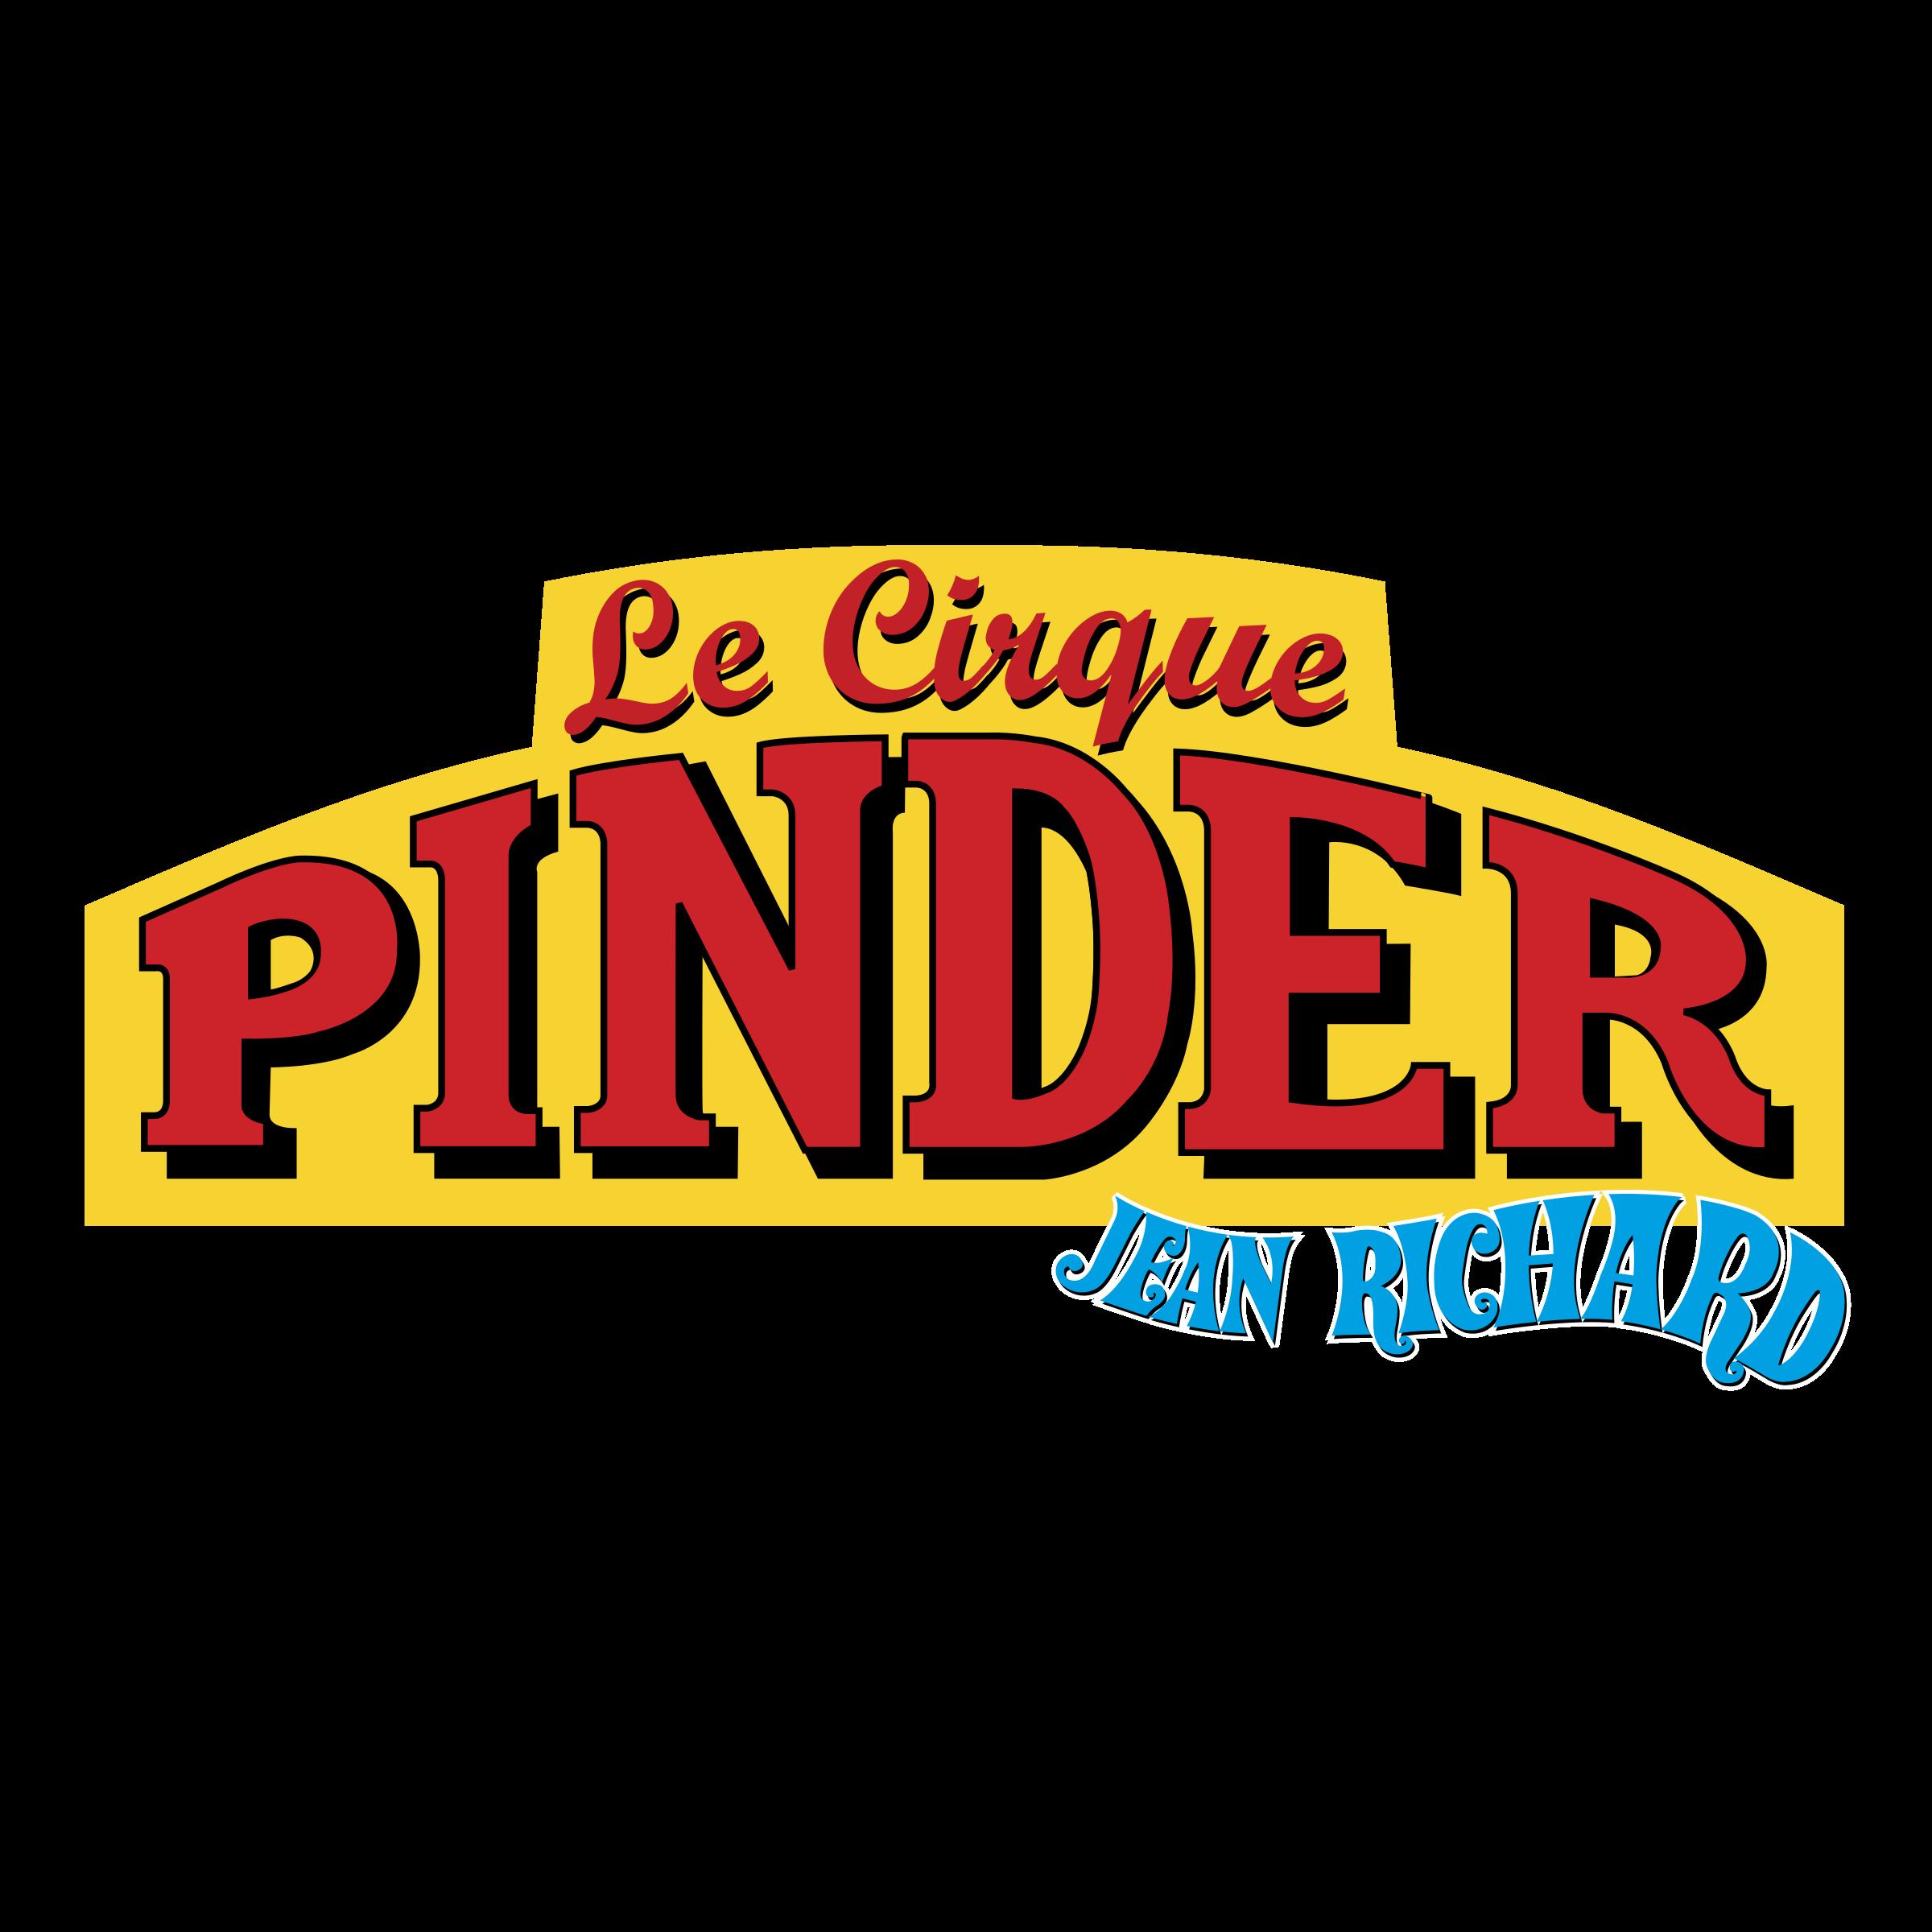 Le Cirque Pinder Logo PNG Transparent & SVG Vector.